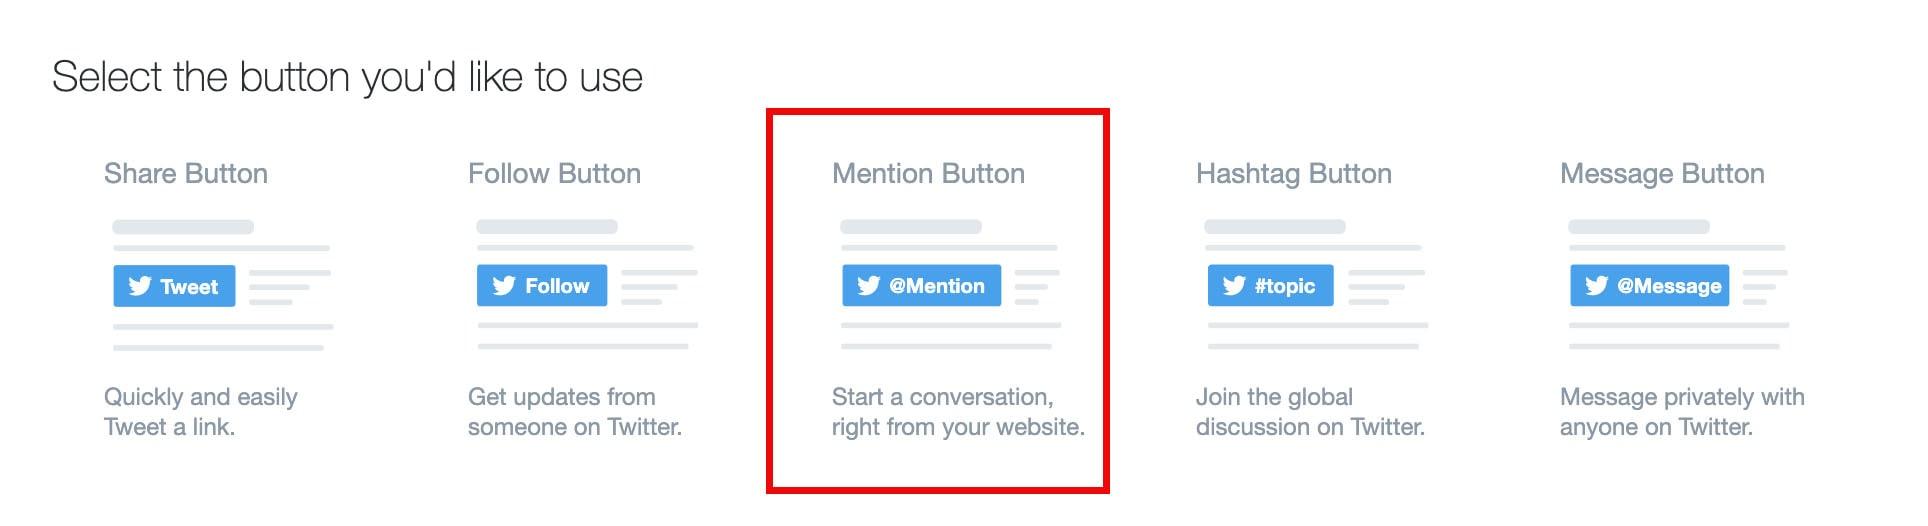 mention button on twitter's developer website